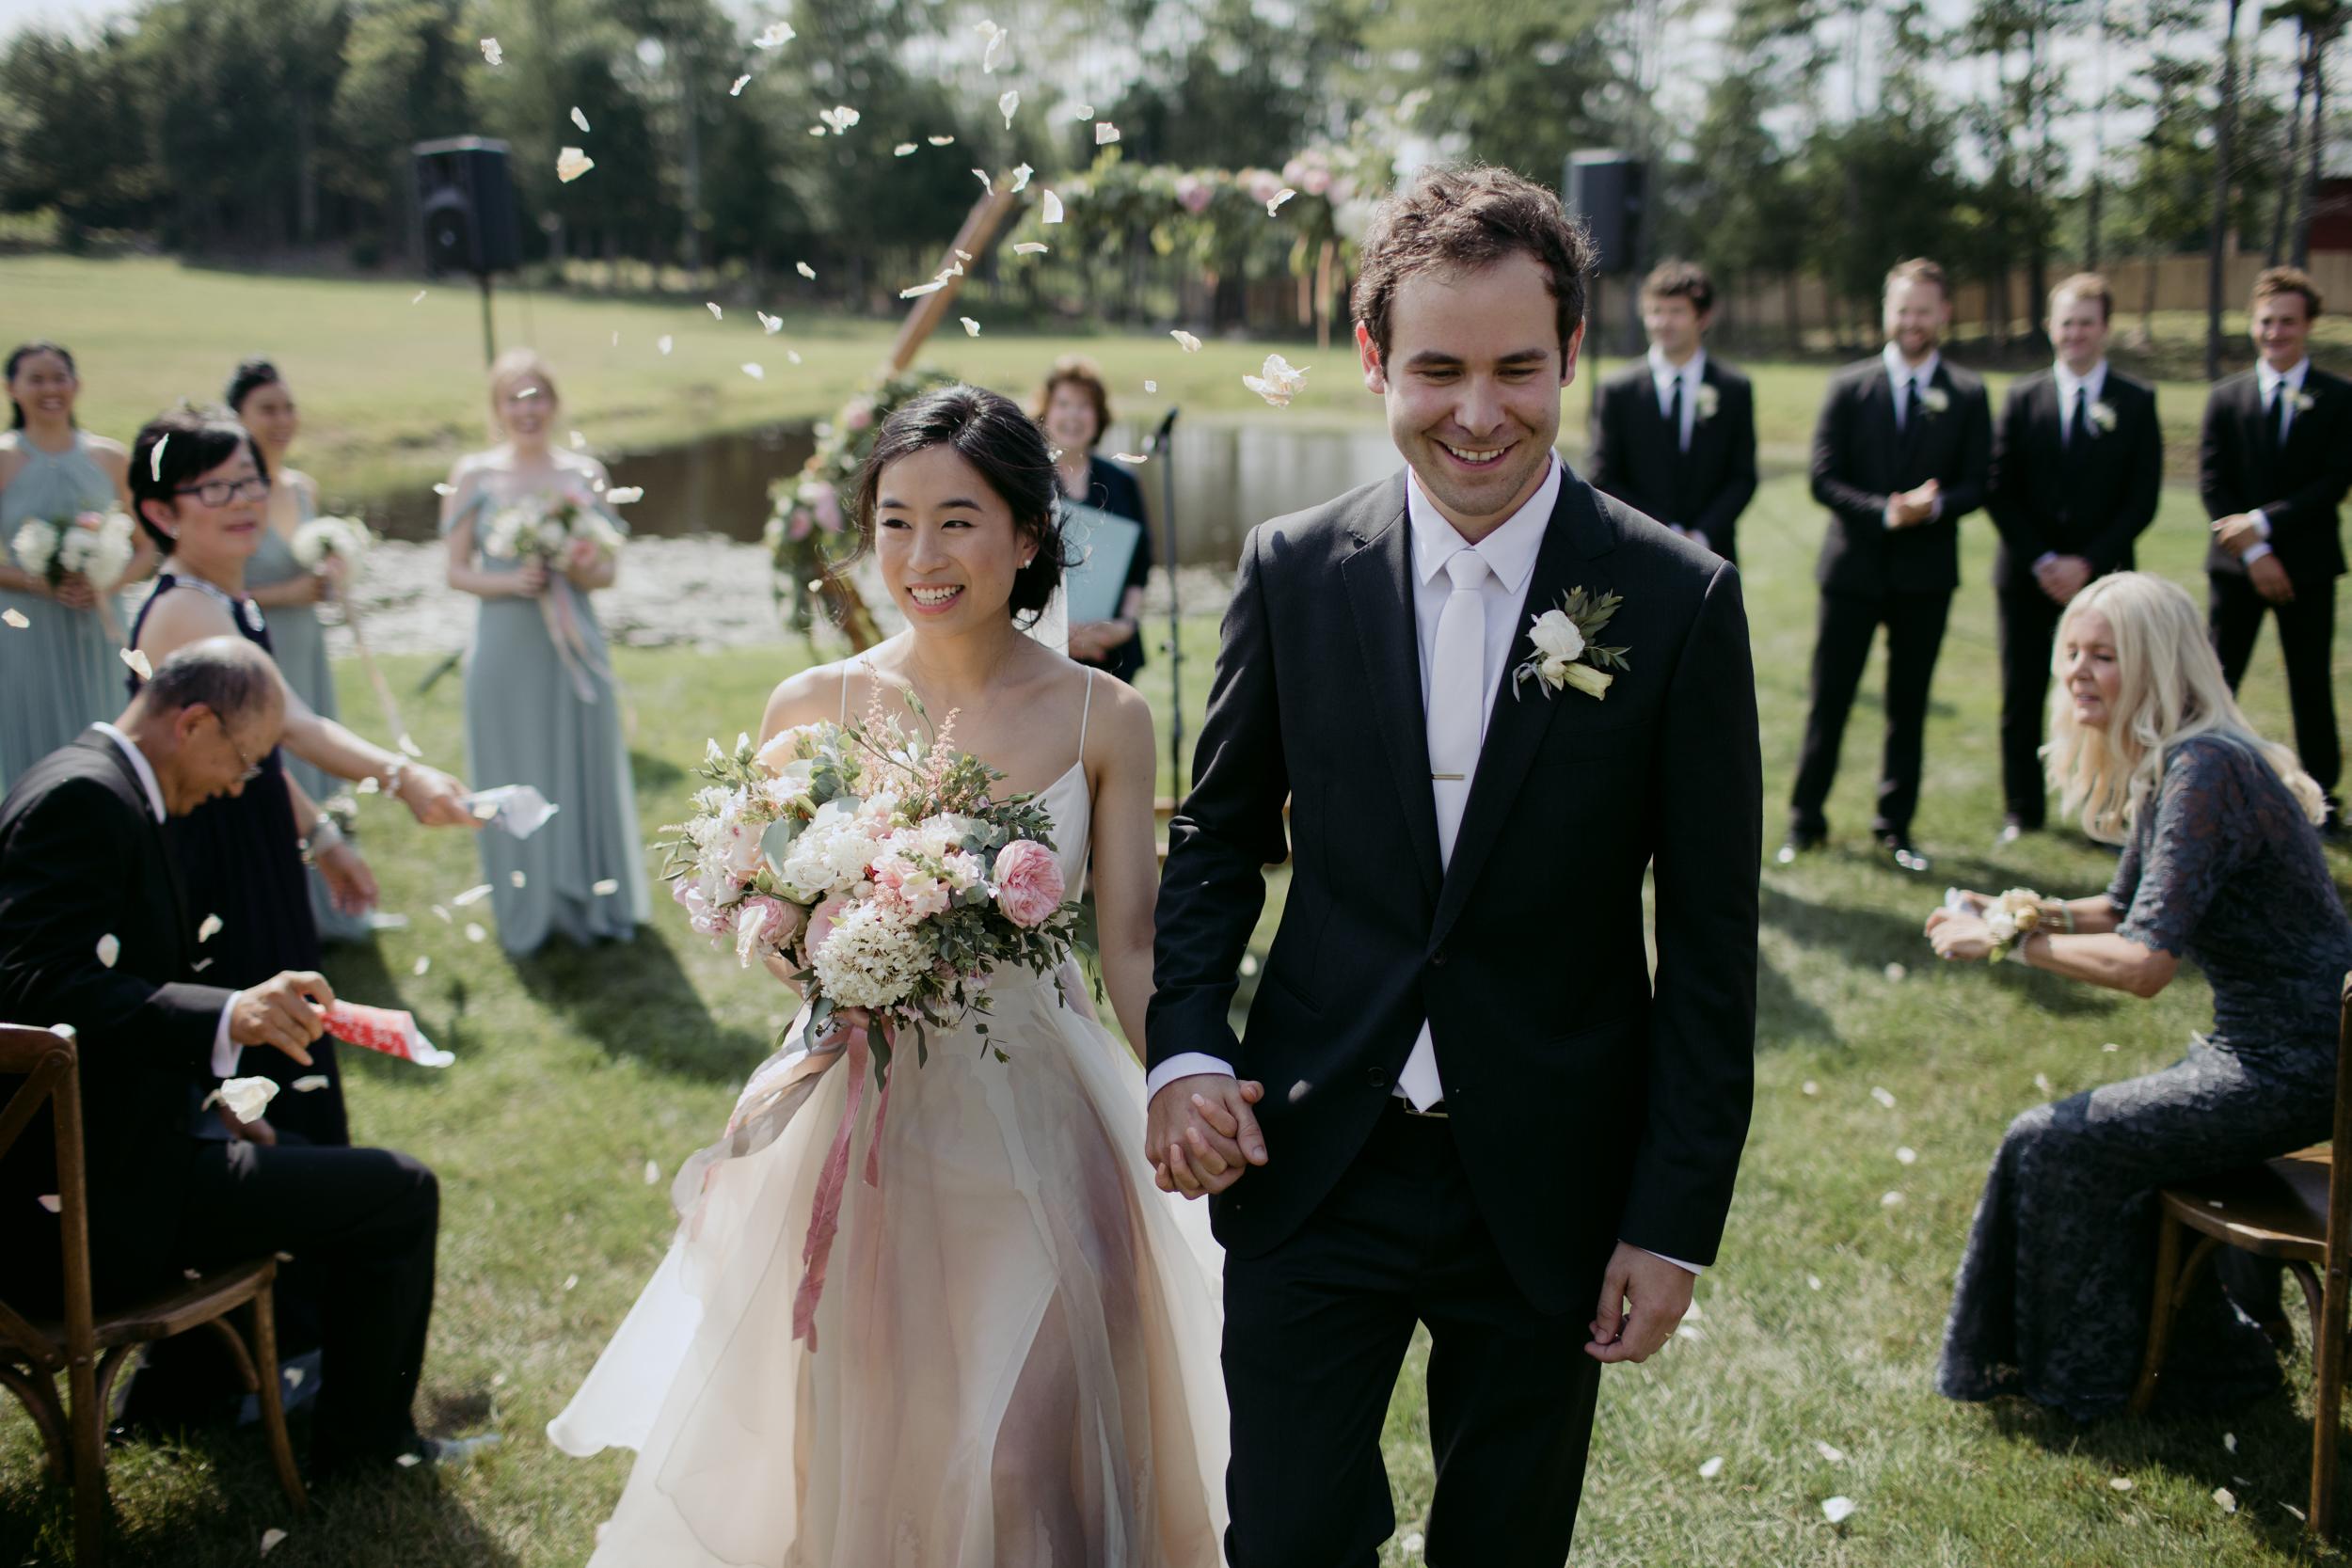 william_allen_farm_wedding_pownal_maine_ilkatayler-18.jpg